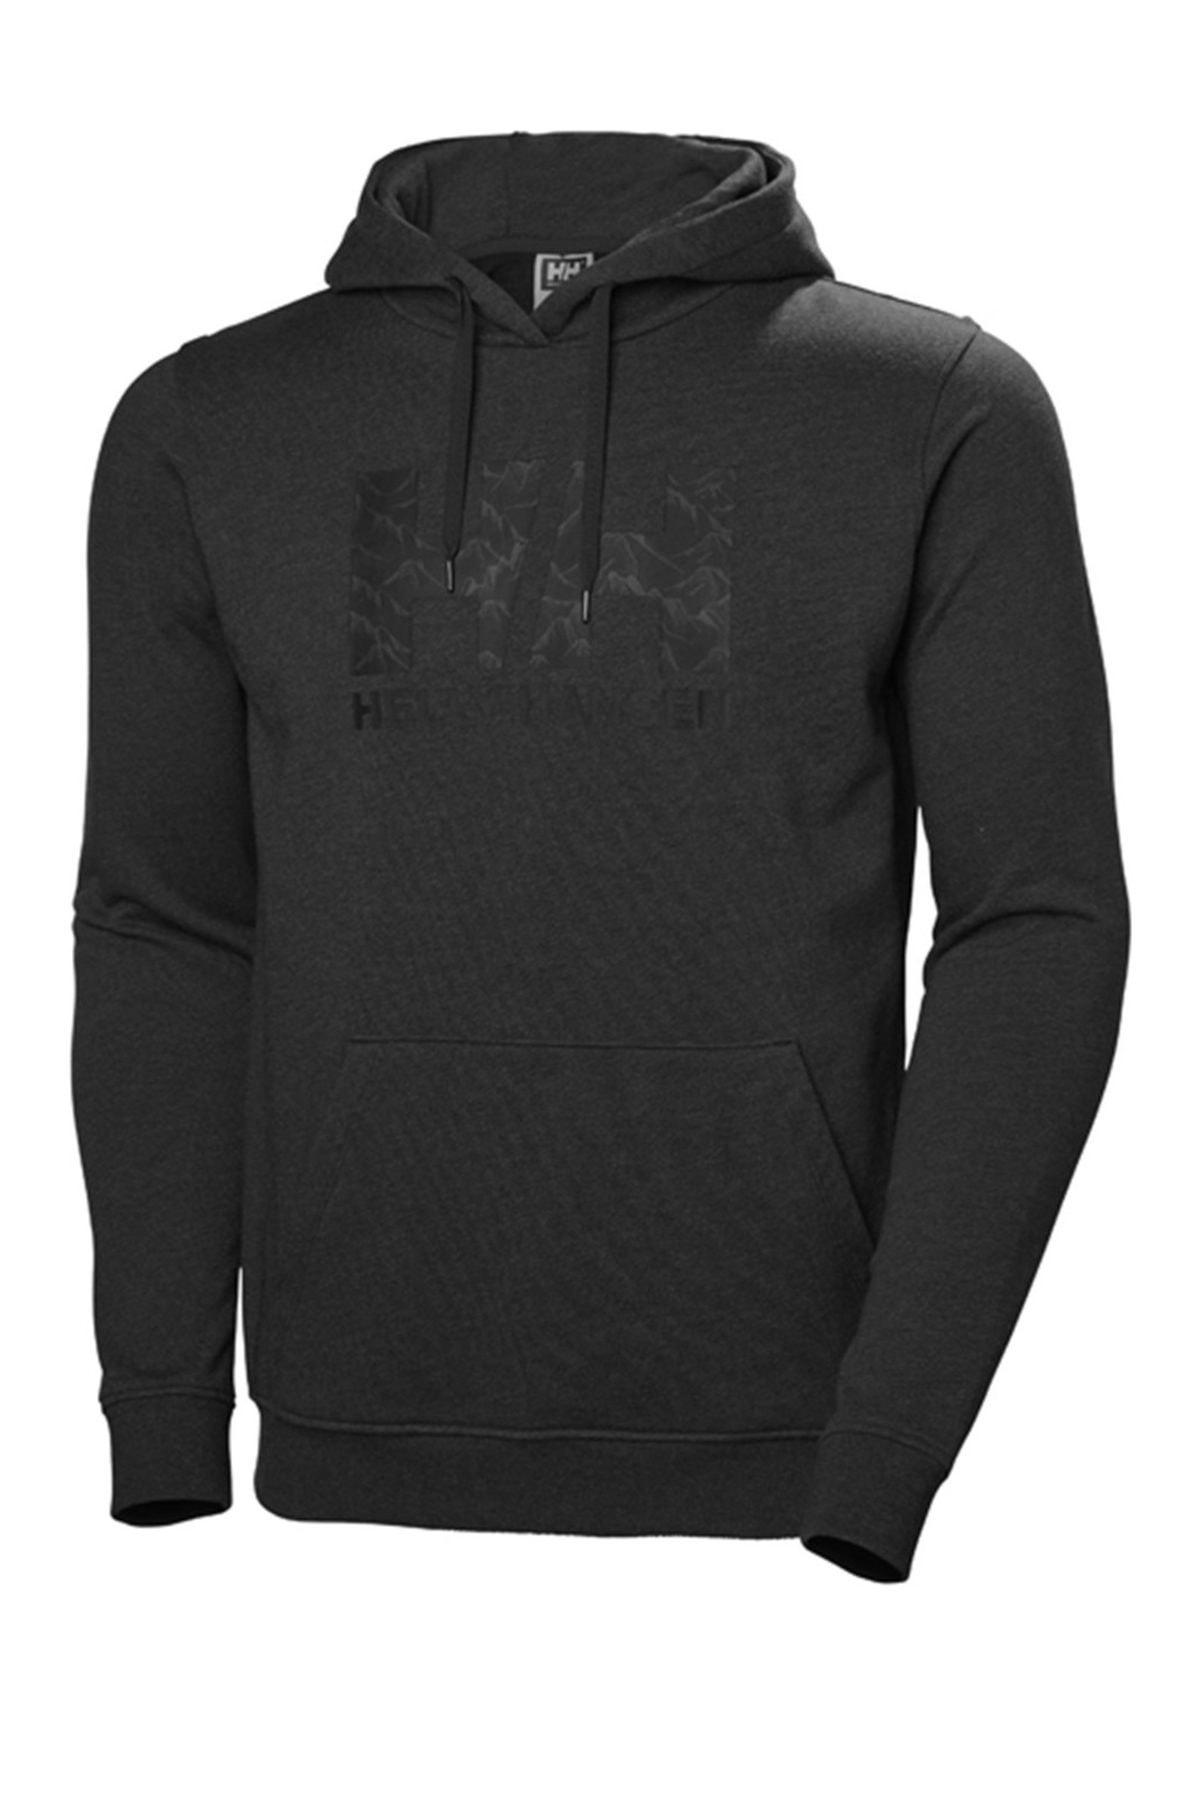 Helly Hansen F2F Cotton Hoodıe Sweatshirt HHA.62934 1